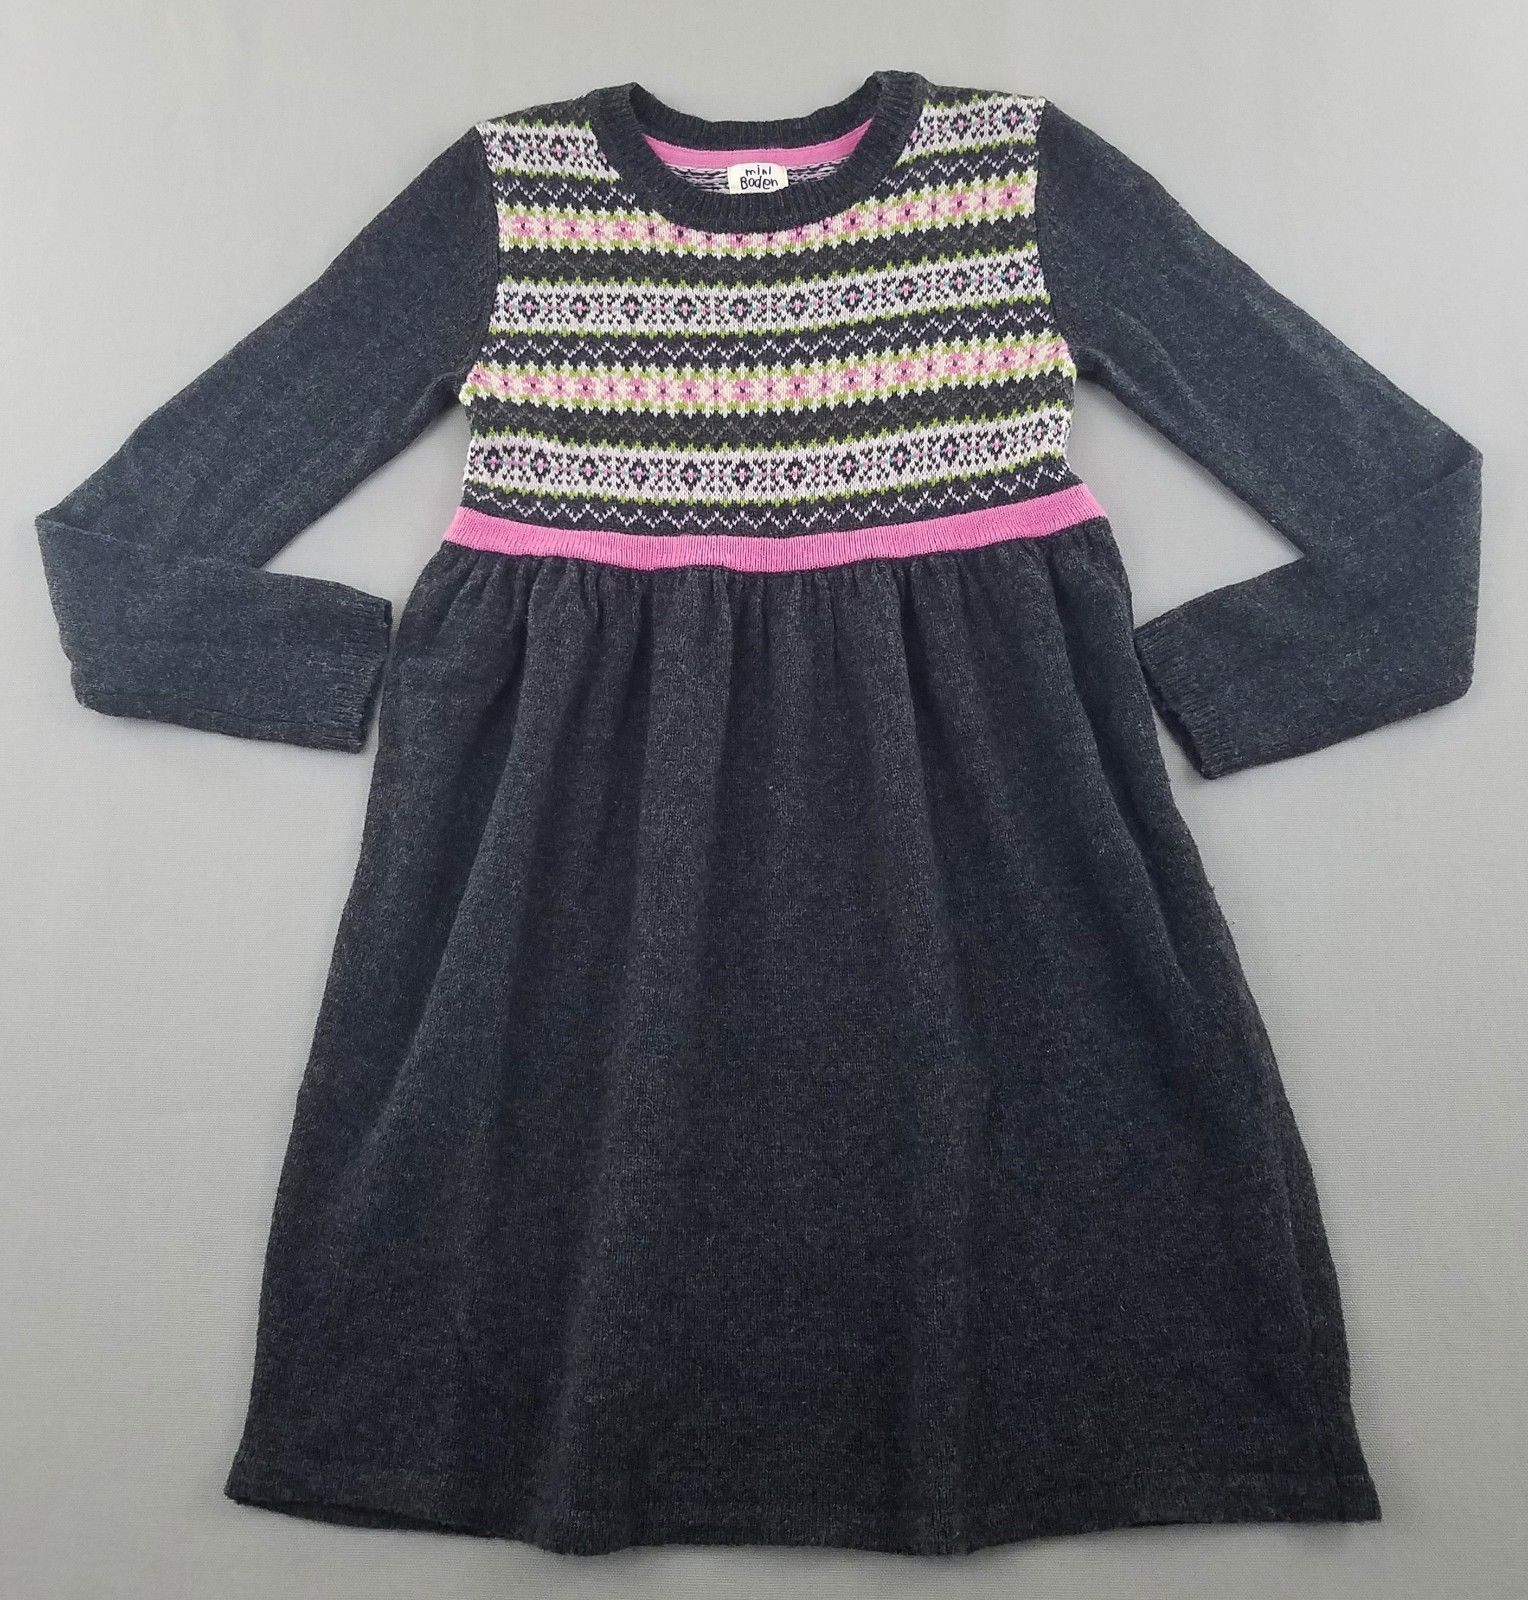 Mini Boden Fair Isle Knitted Sweater Dress | Mini Boden Girls ...